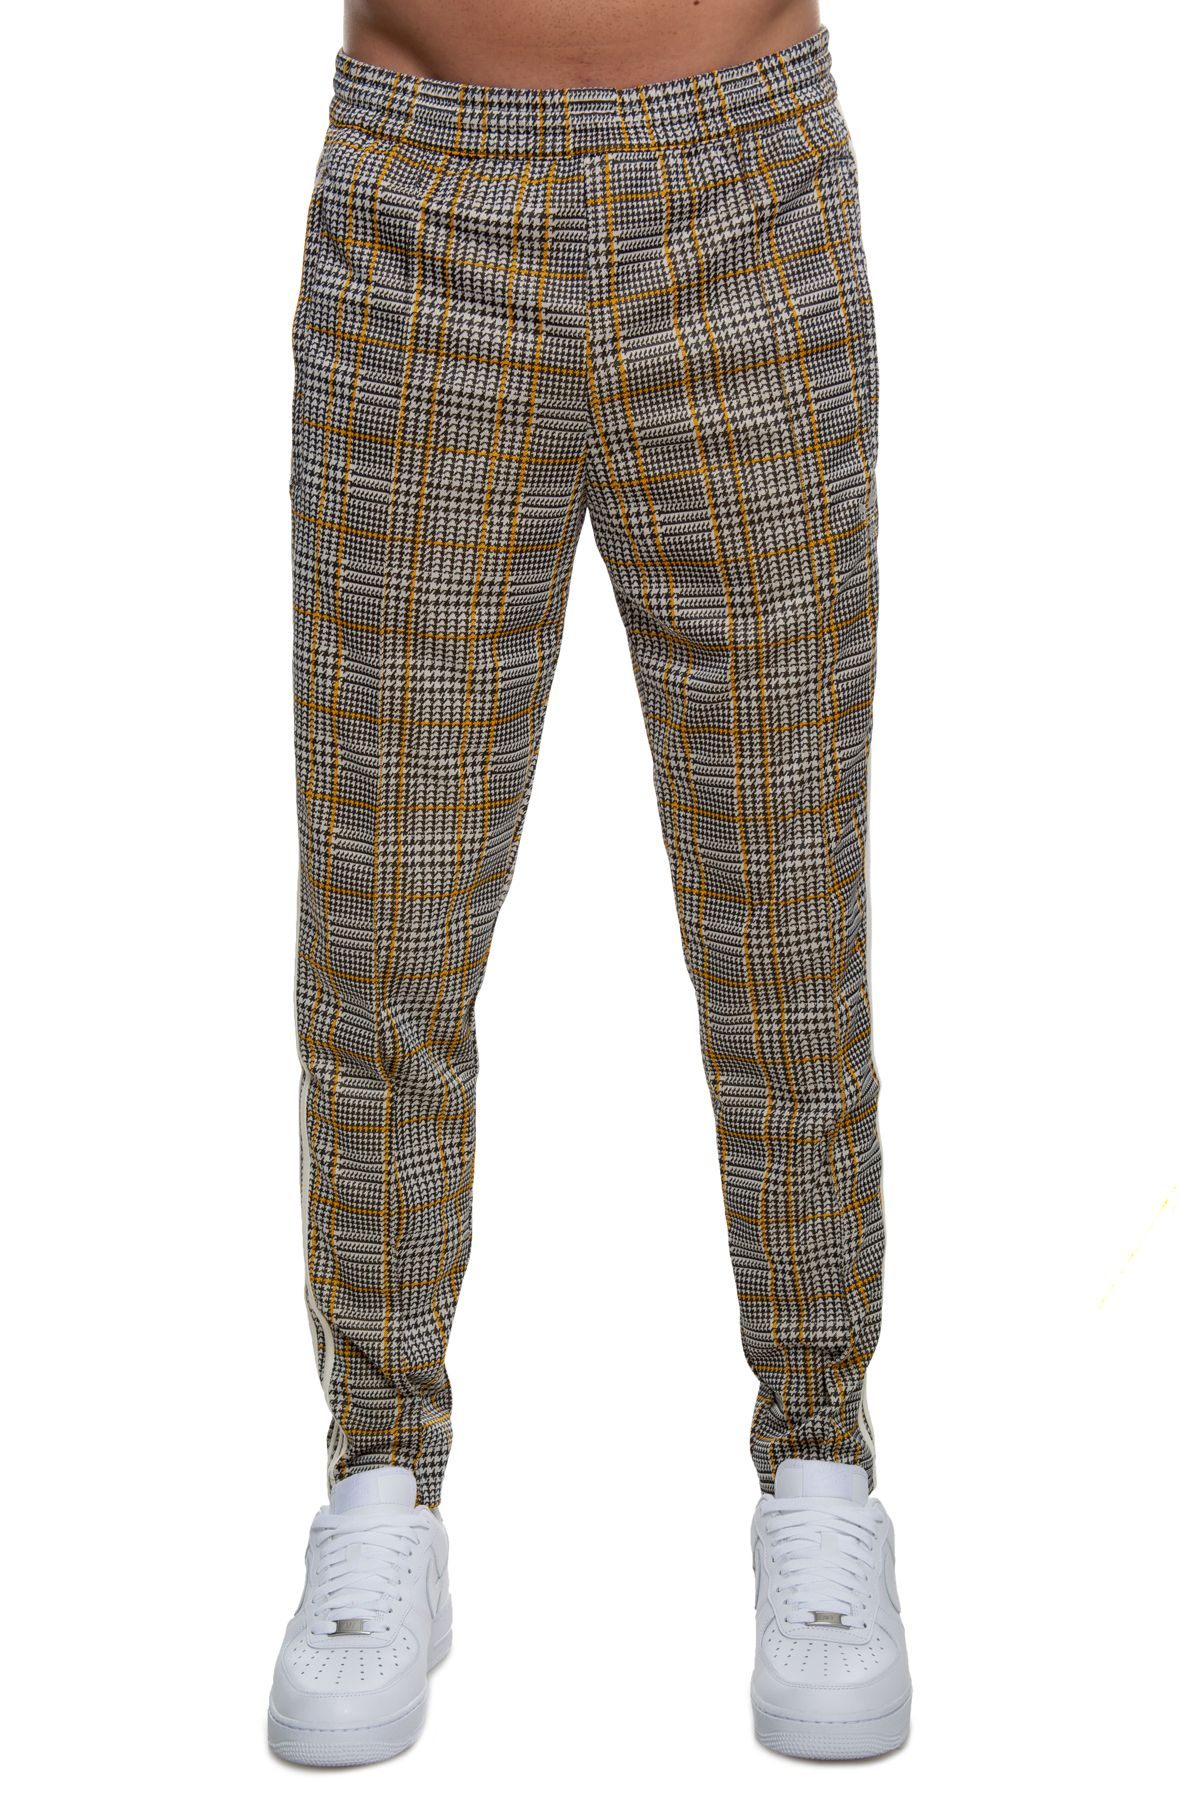 adidas Originals x SPEZIAL Beckenbauer Track Pant Sizes S XL